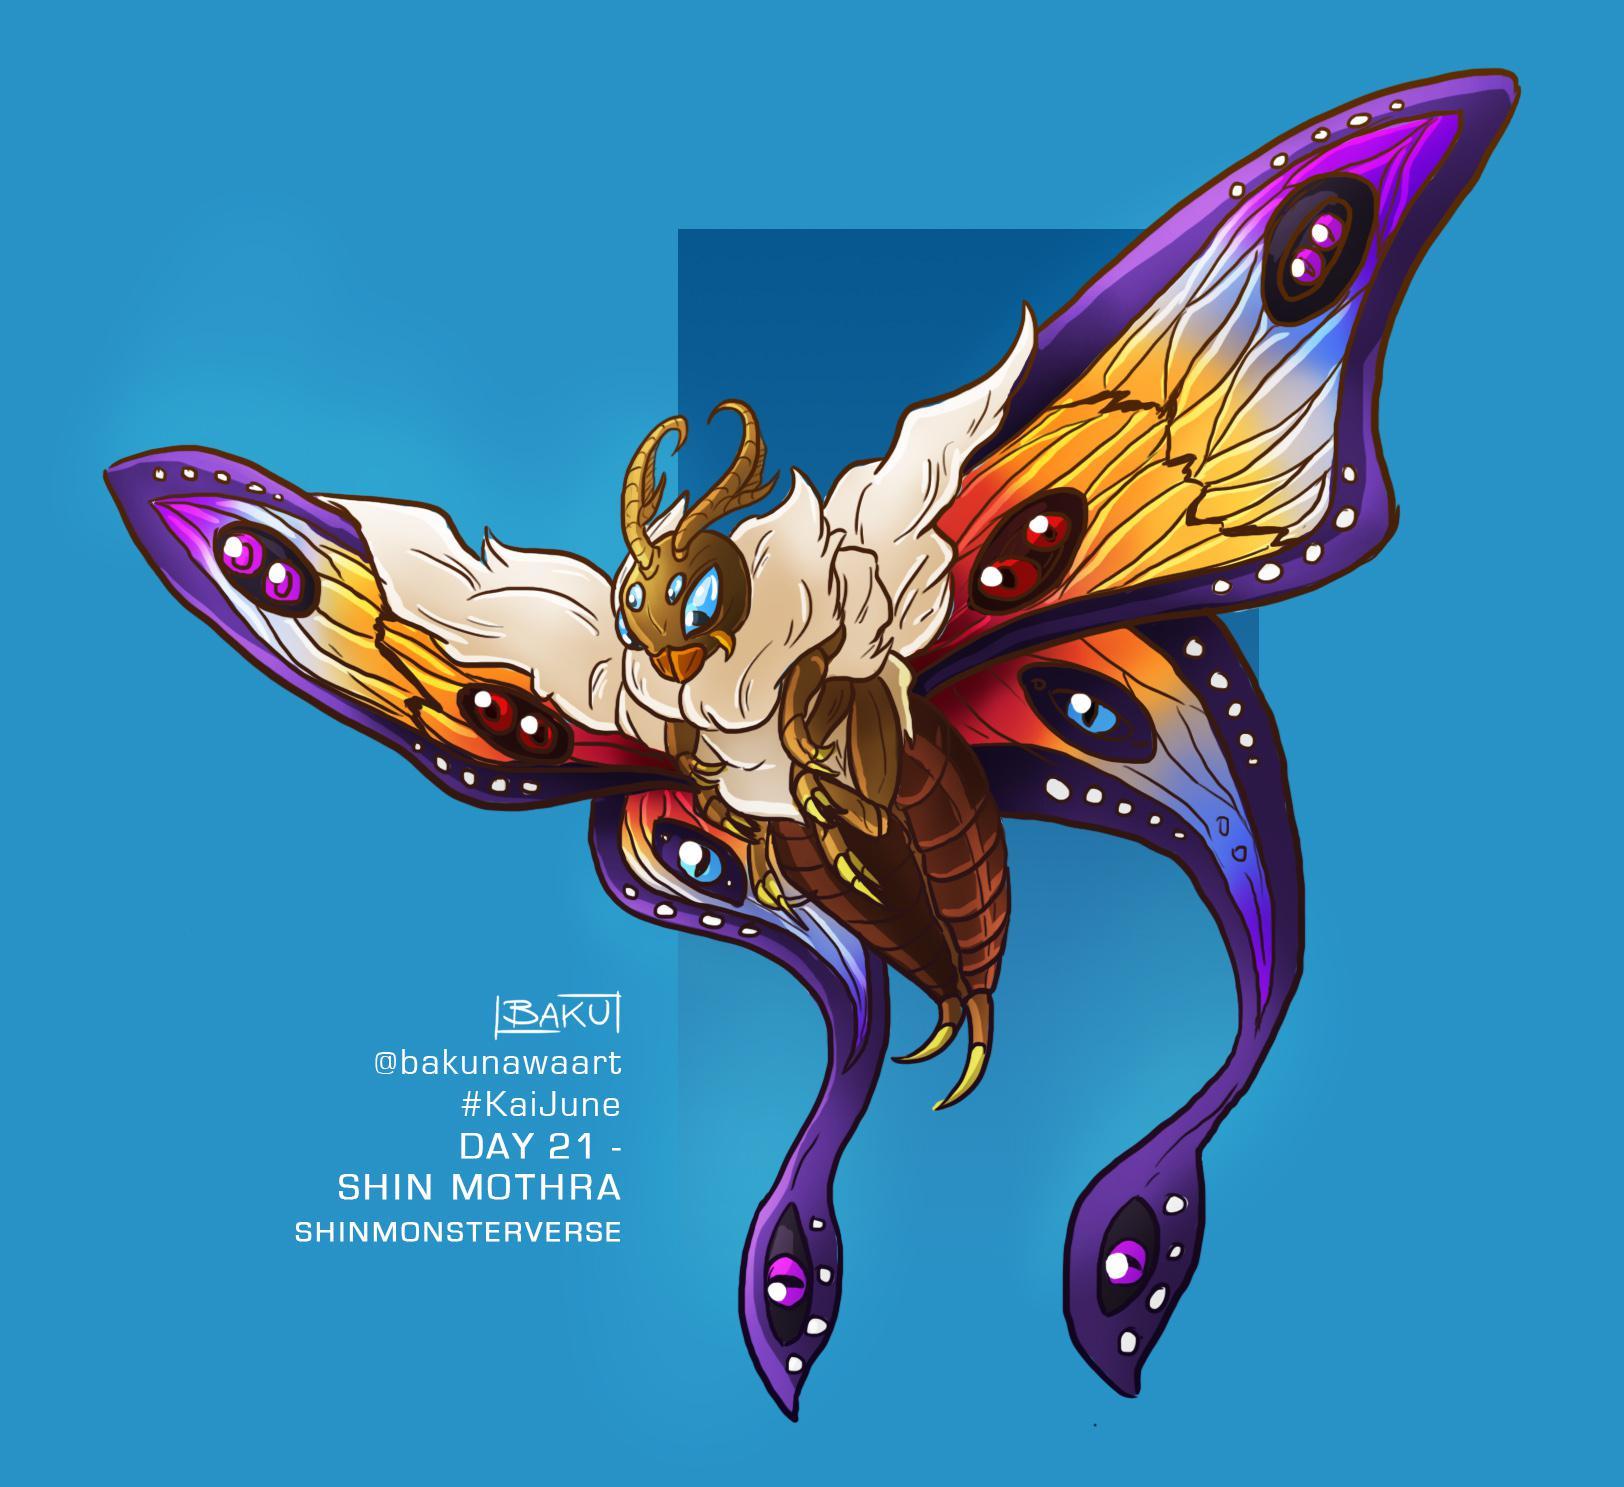 Shin Mothra